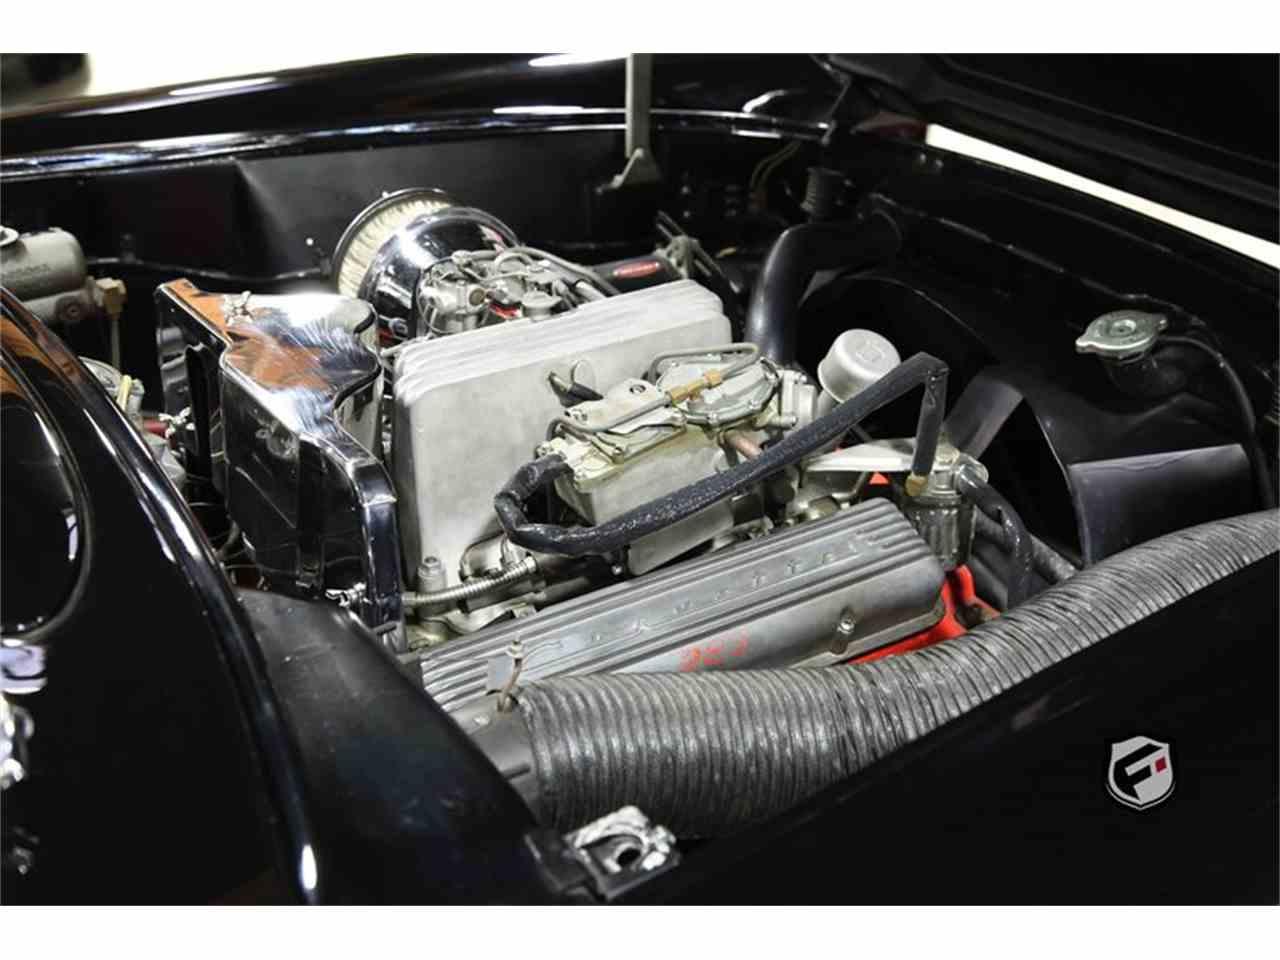 Large Picture of Classic 1957 Corvette located in California - $99,900.00 - MBTJ